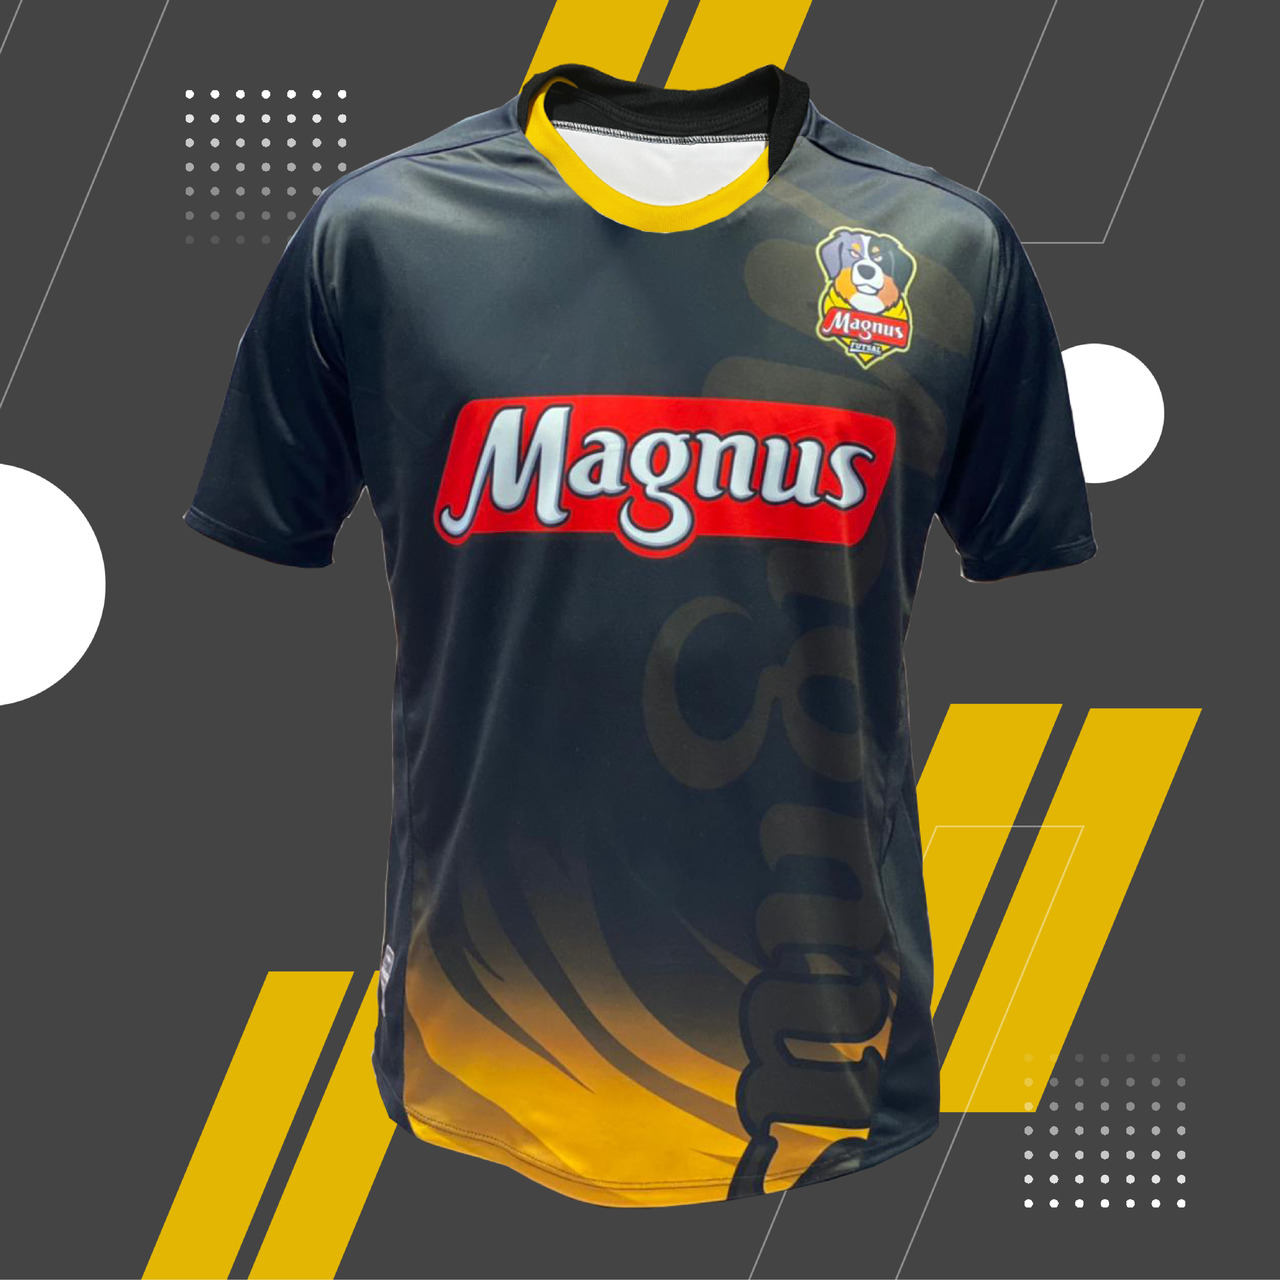 Camiseta Magnus Treino Goleiro 2021